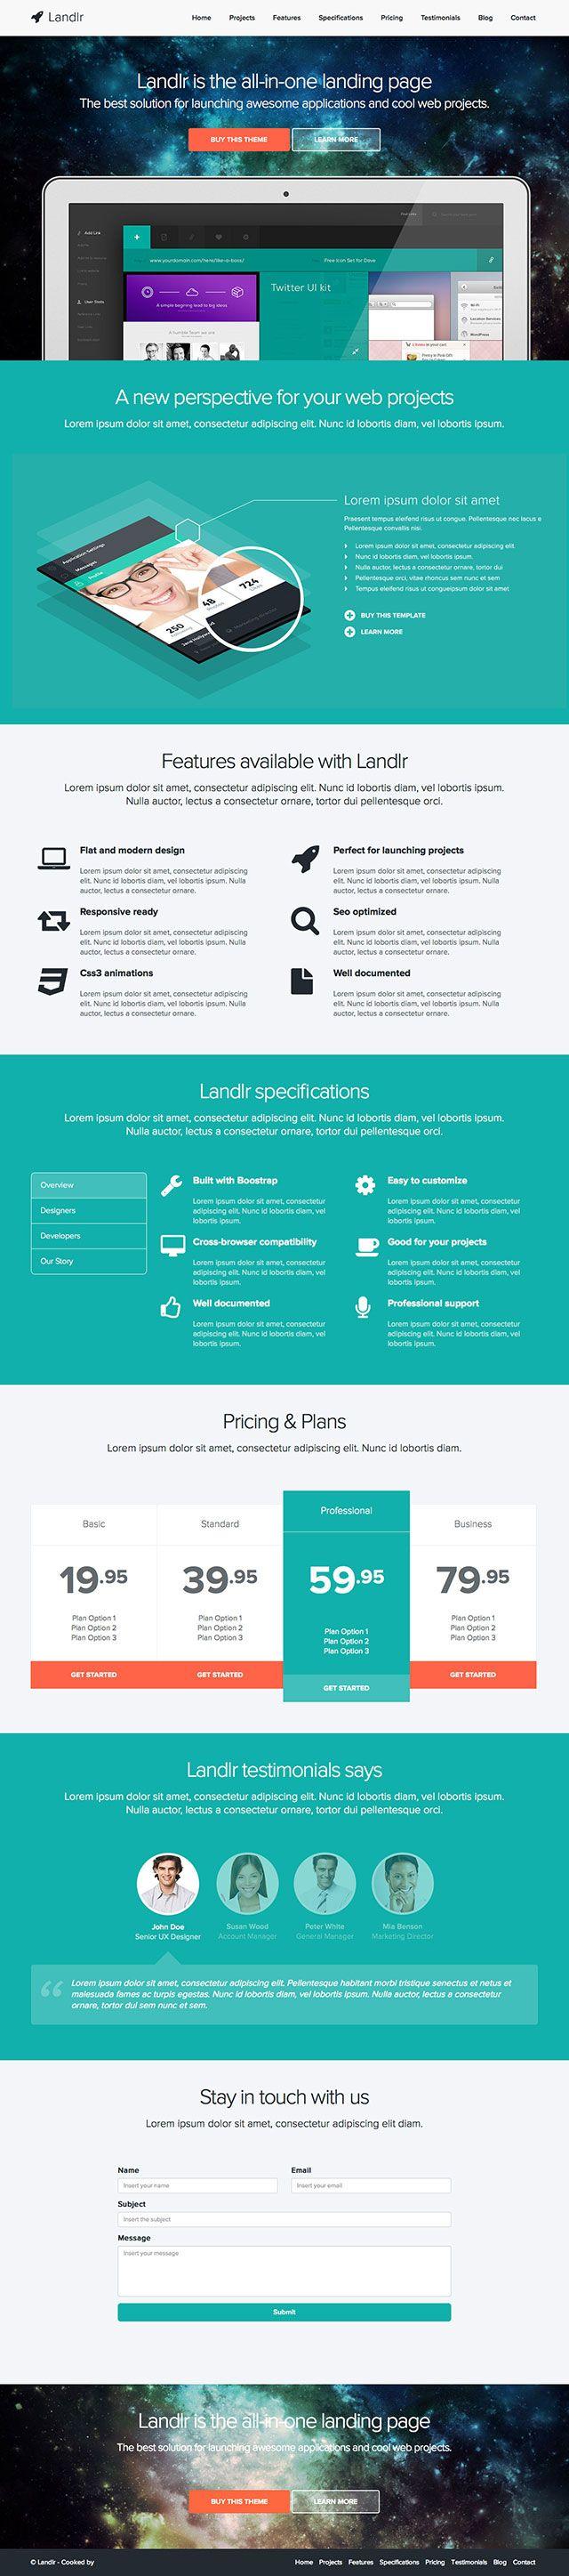 10+ Best Landing Page WordPress Themes 2016 - Useful Blogging